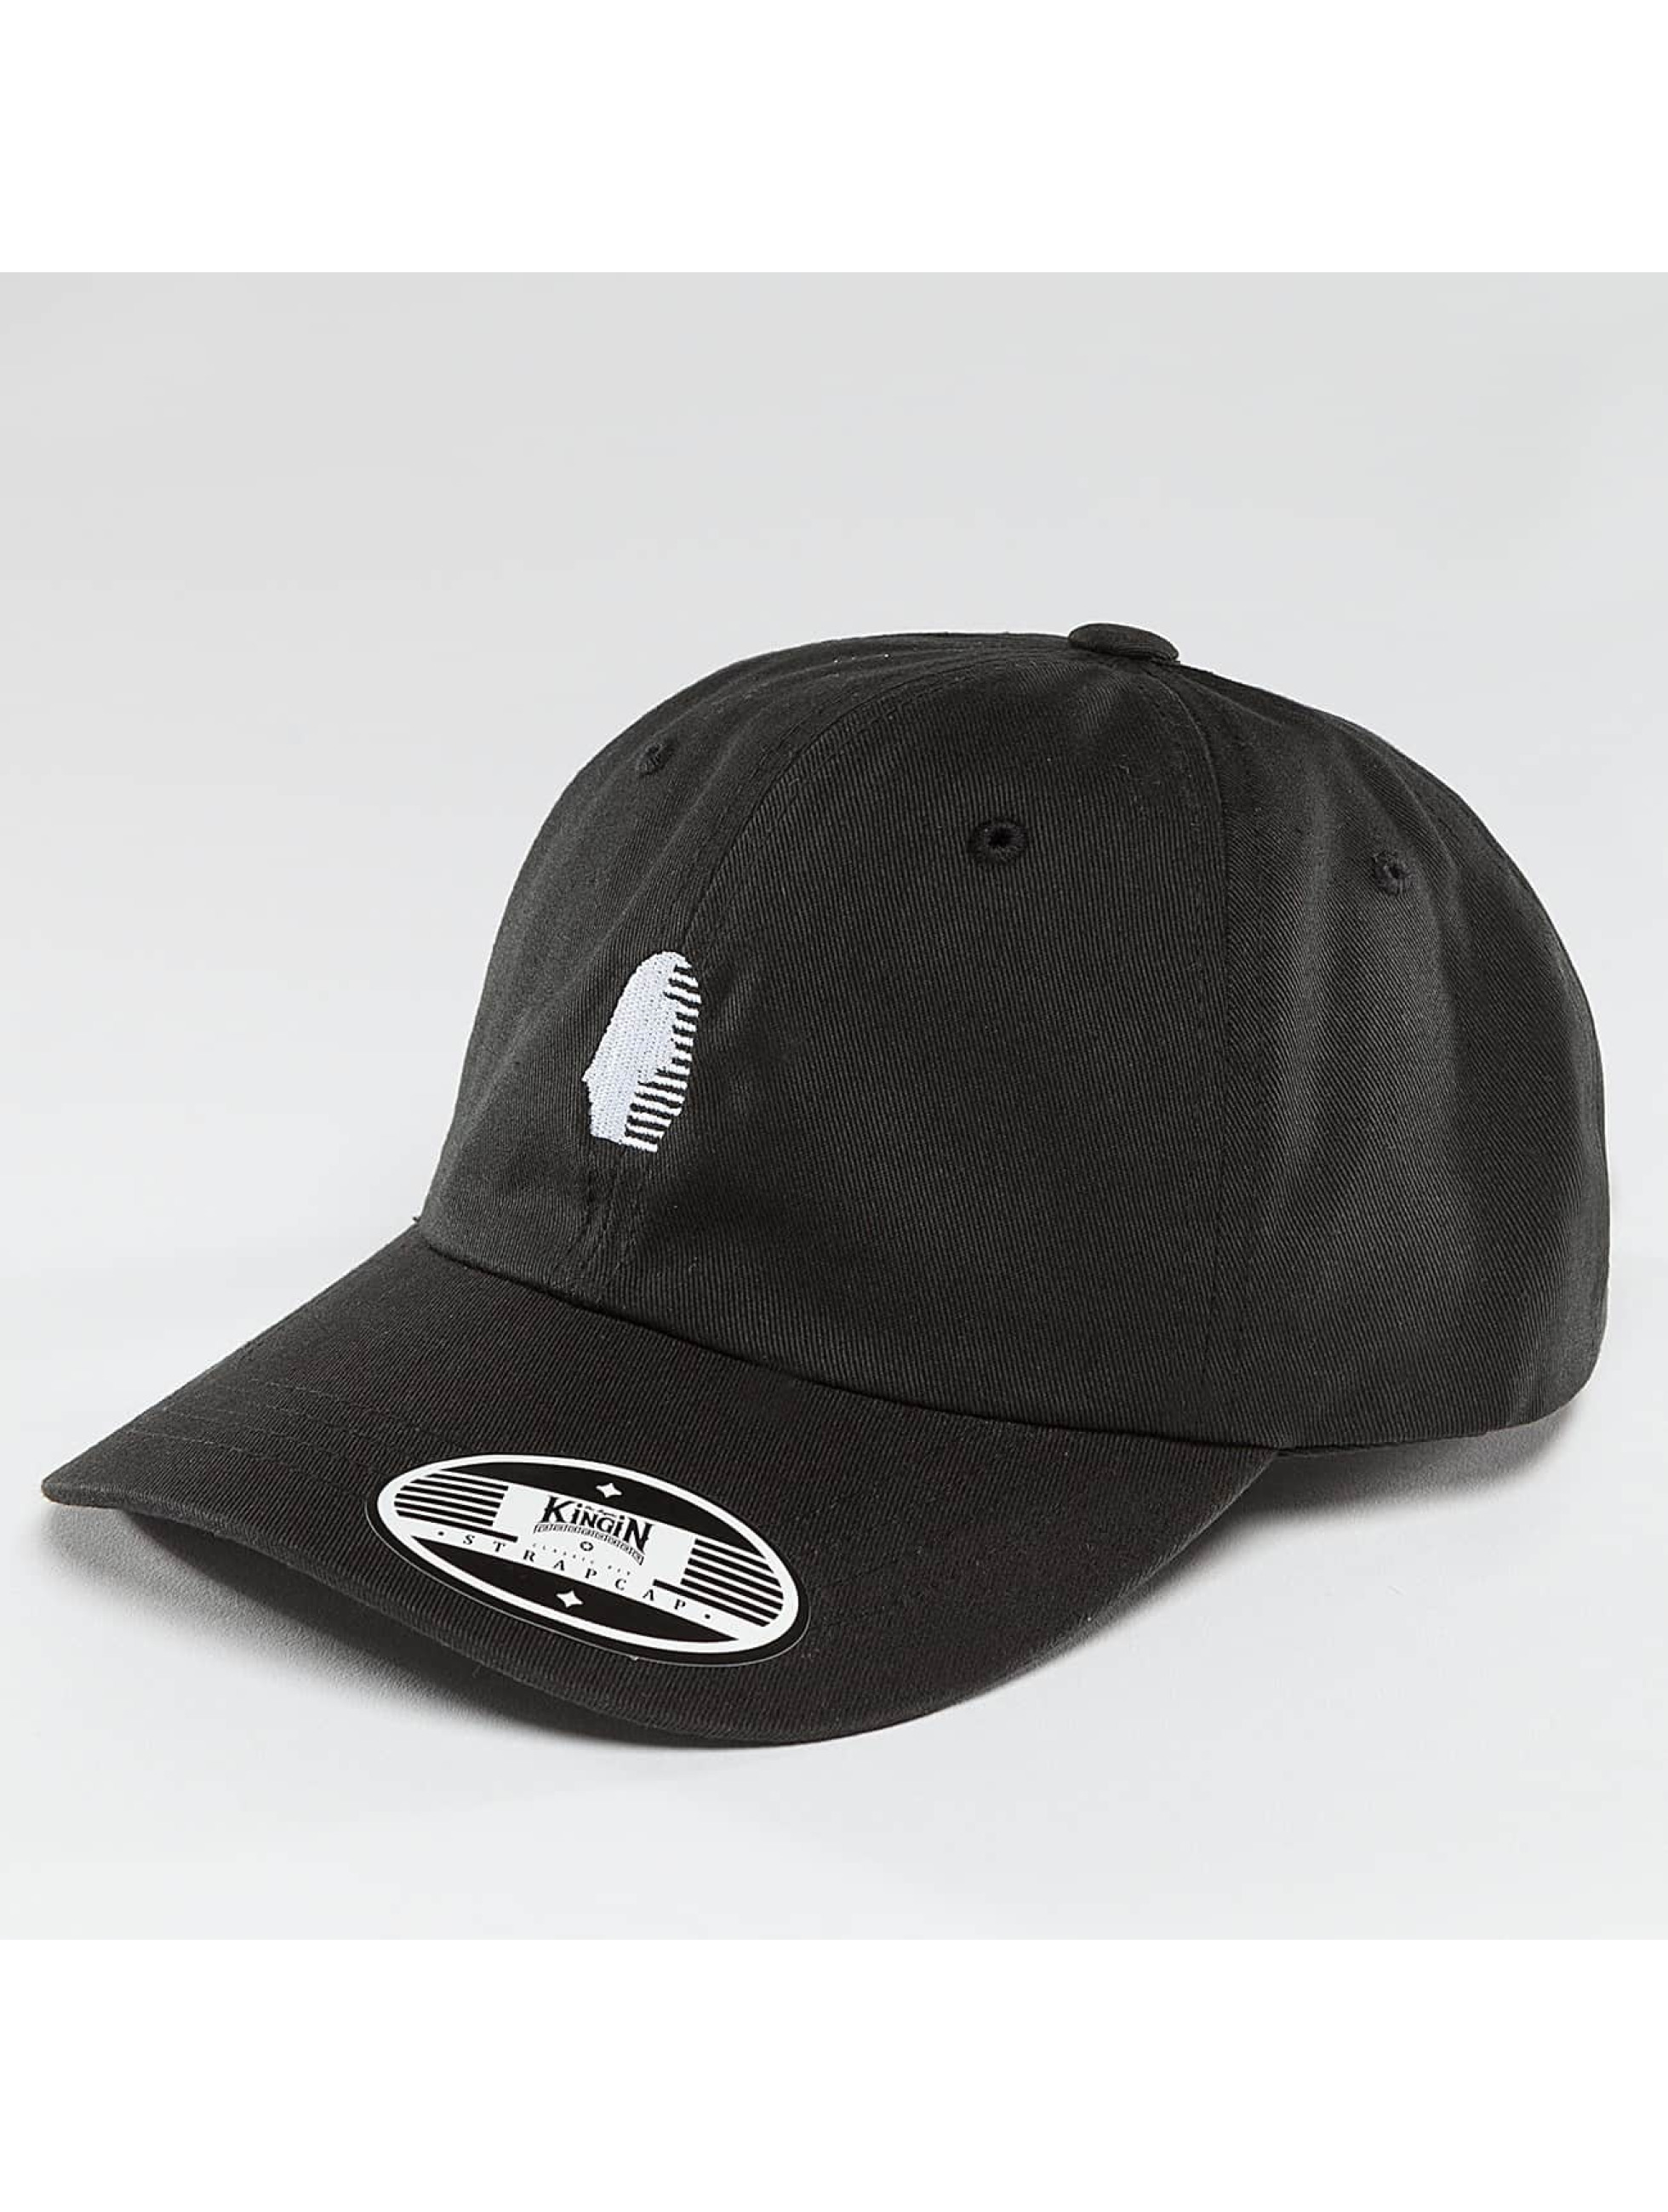 Kingin Männer,Frauen Snapback Cap OG in schwarz